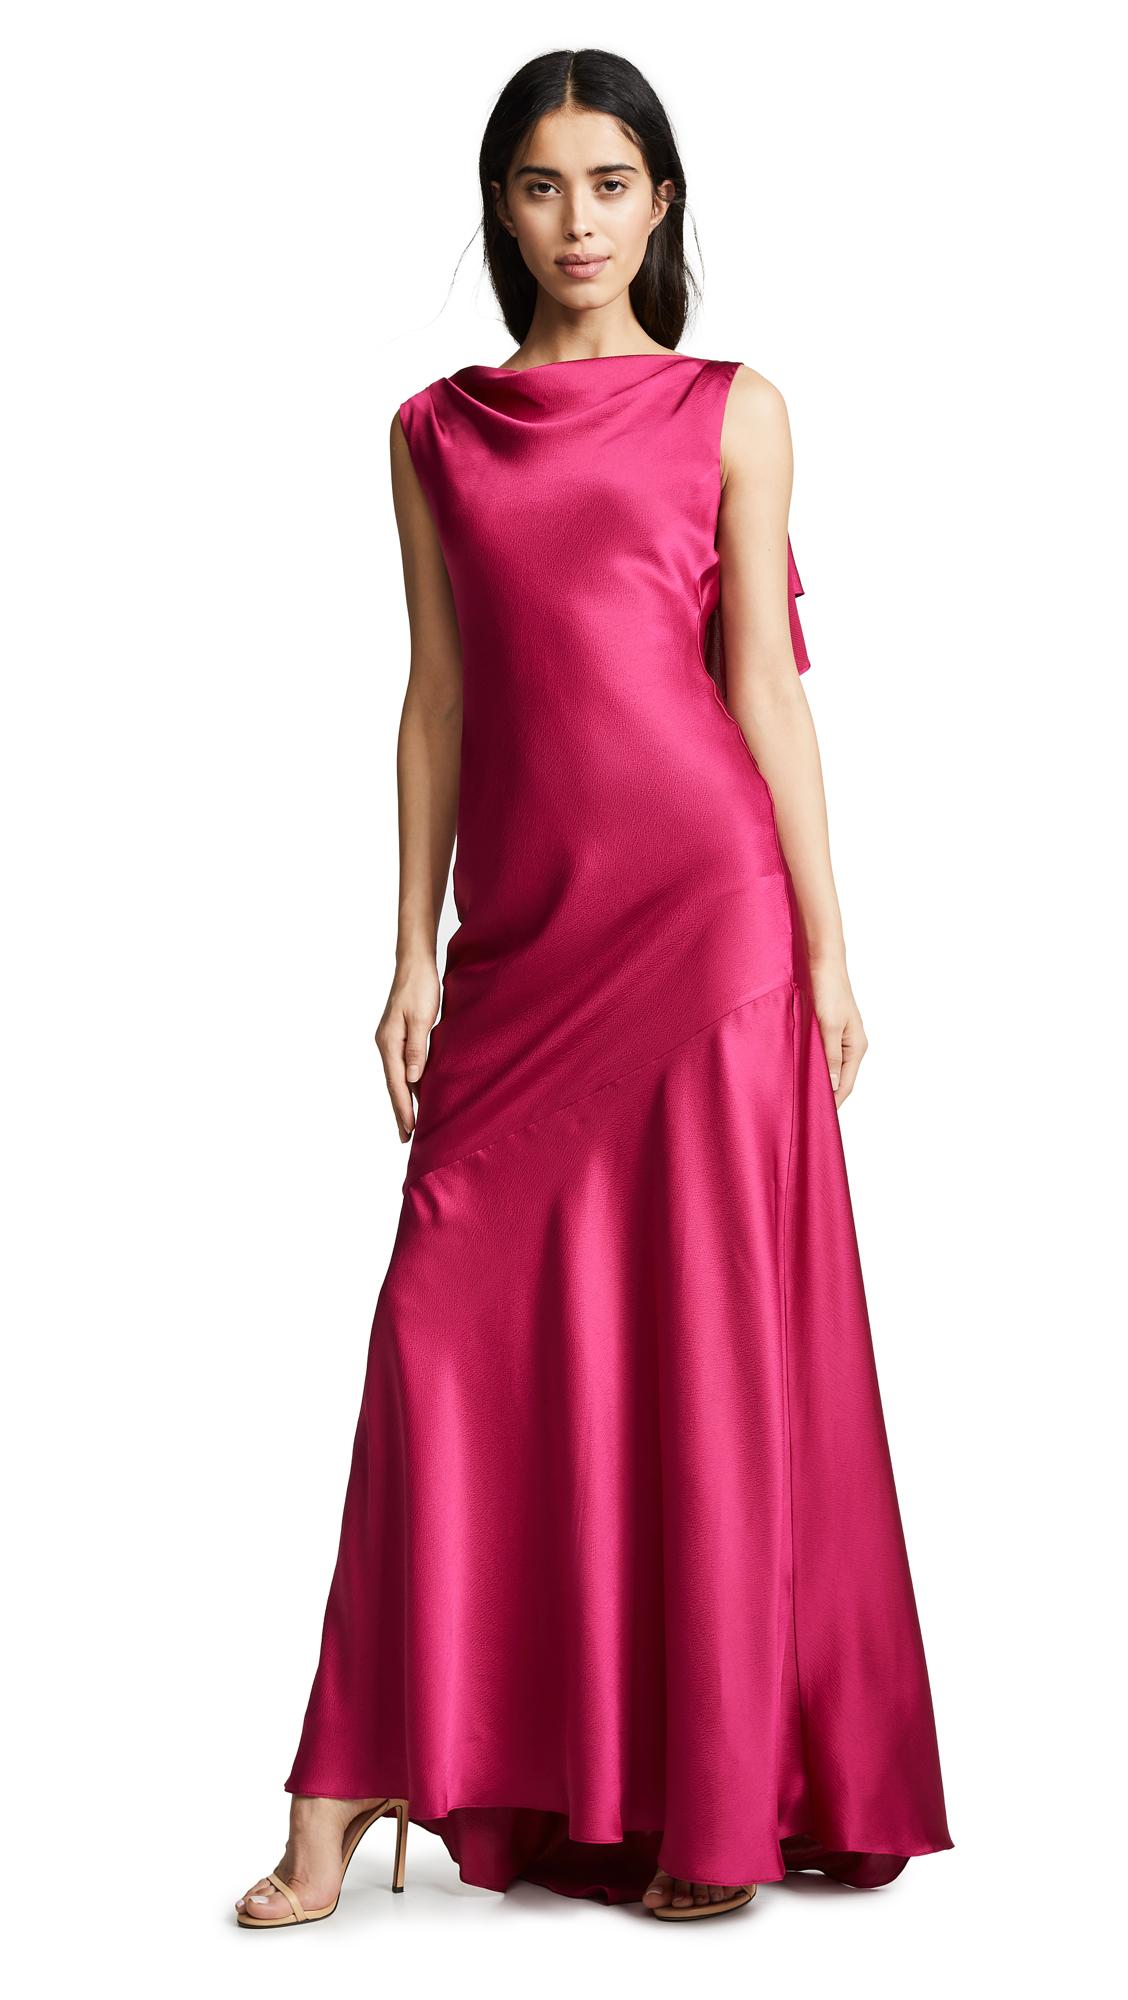 Rachel Zoe Ami Gown - Royal Fuchsia